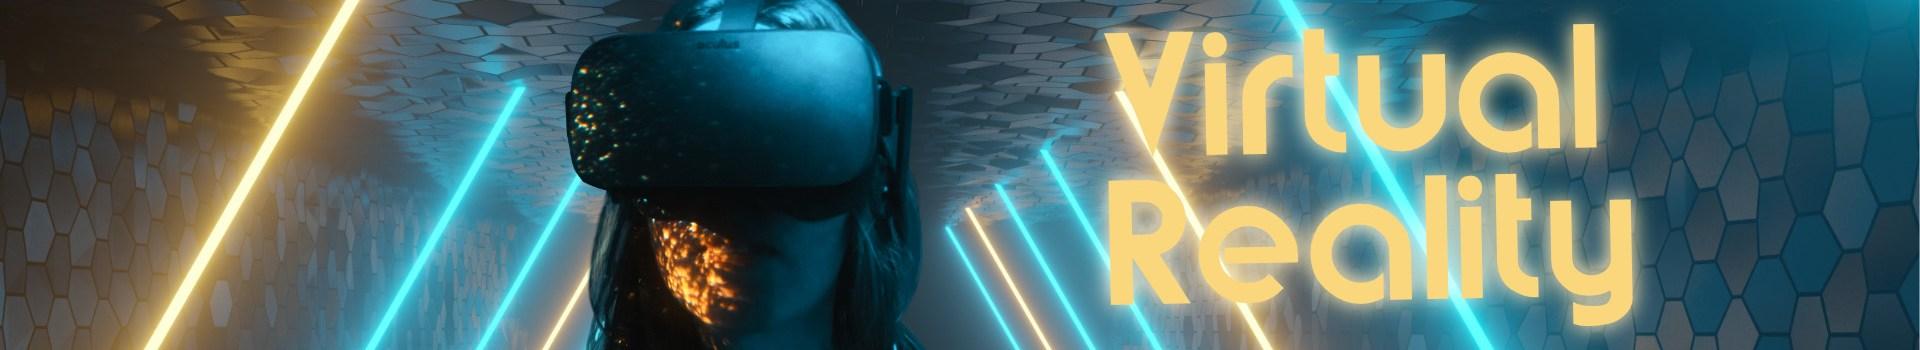 Virtual Reality mit der Oculus Rift